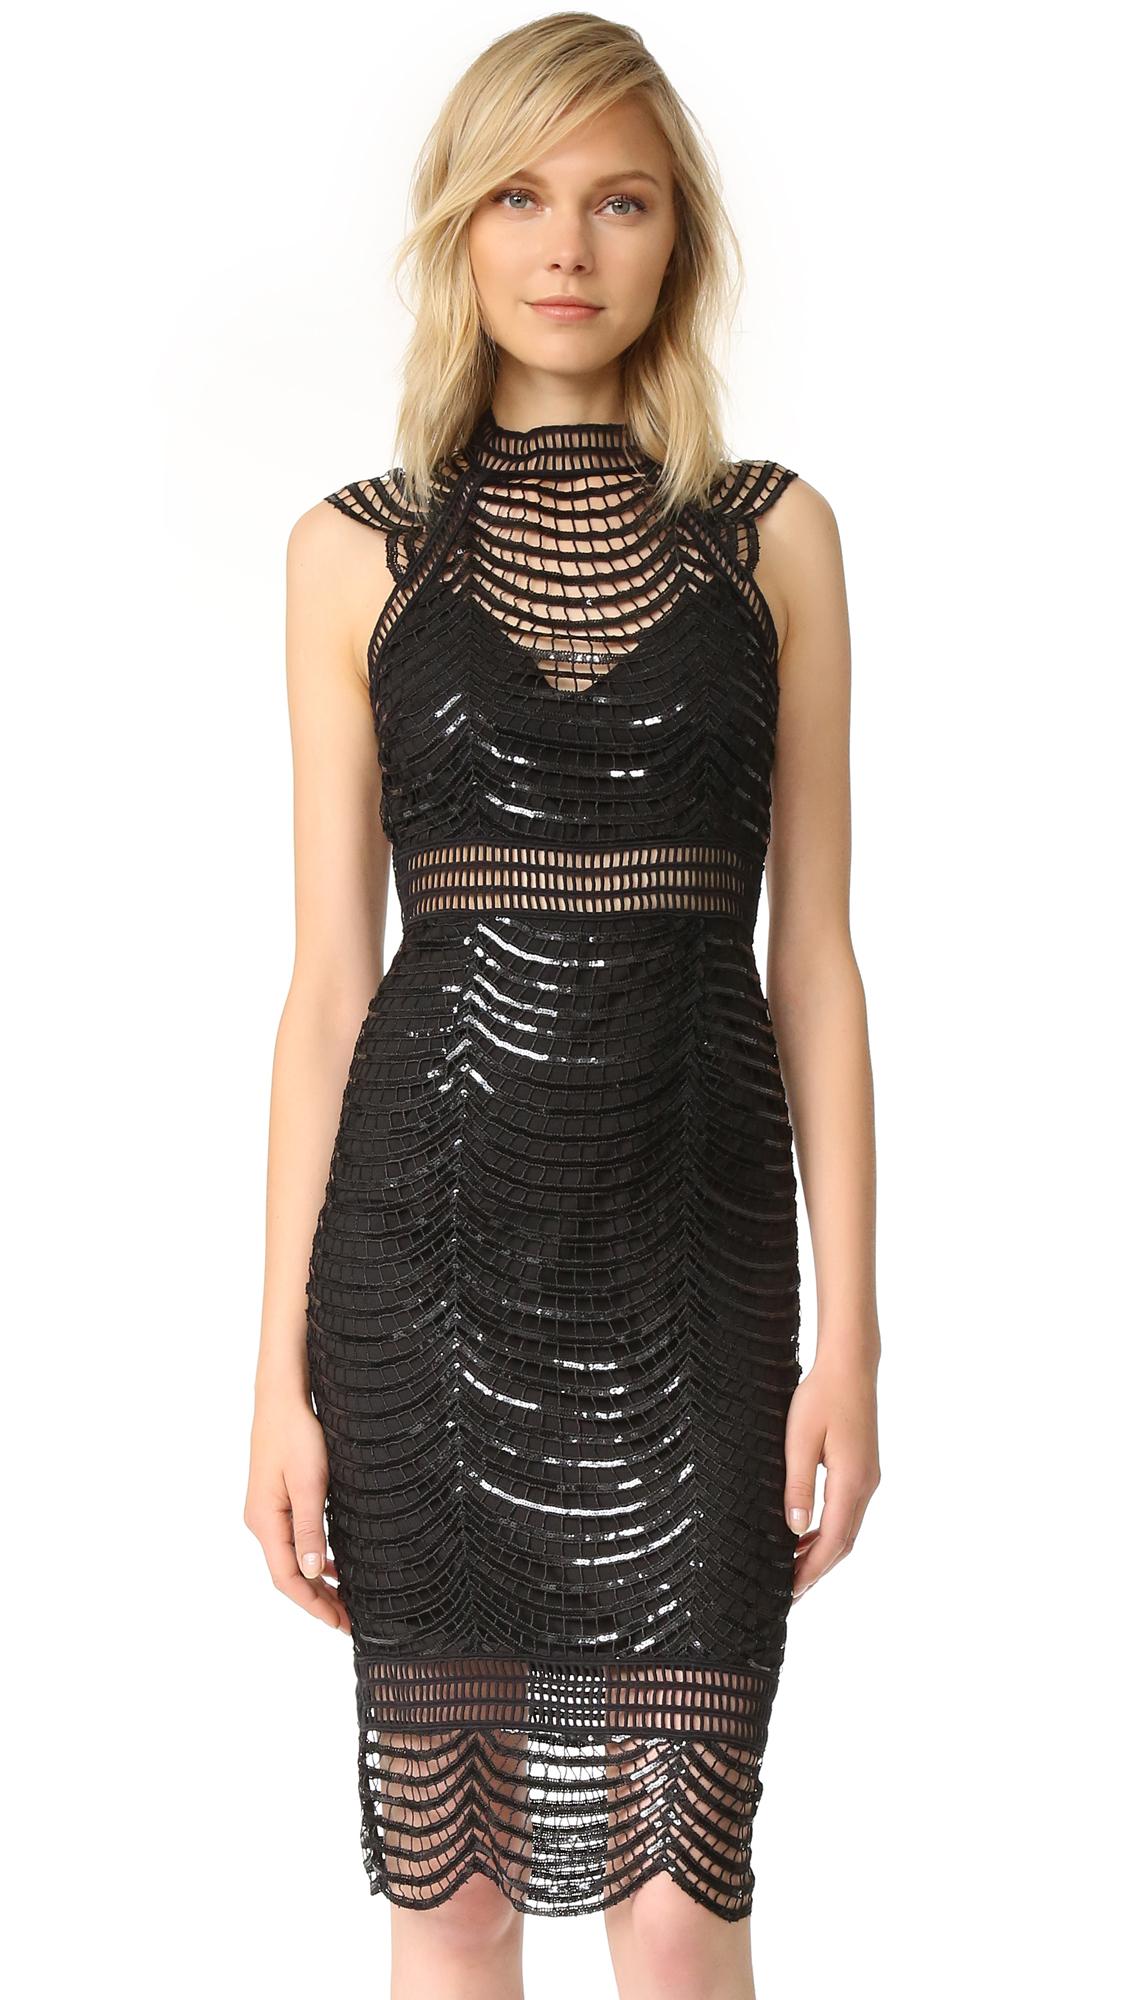 Saylor Heloise Scallop Sequin Dress - Black